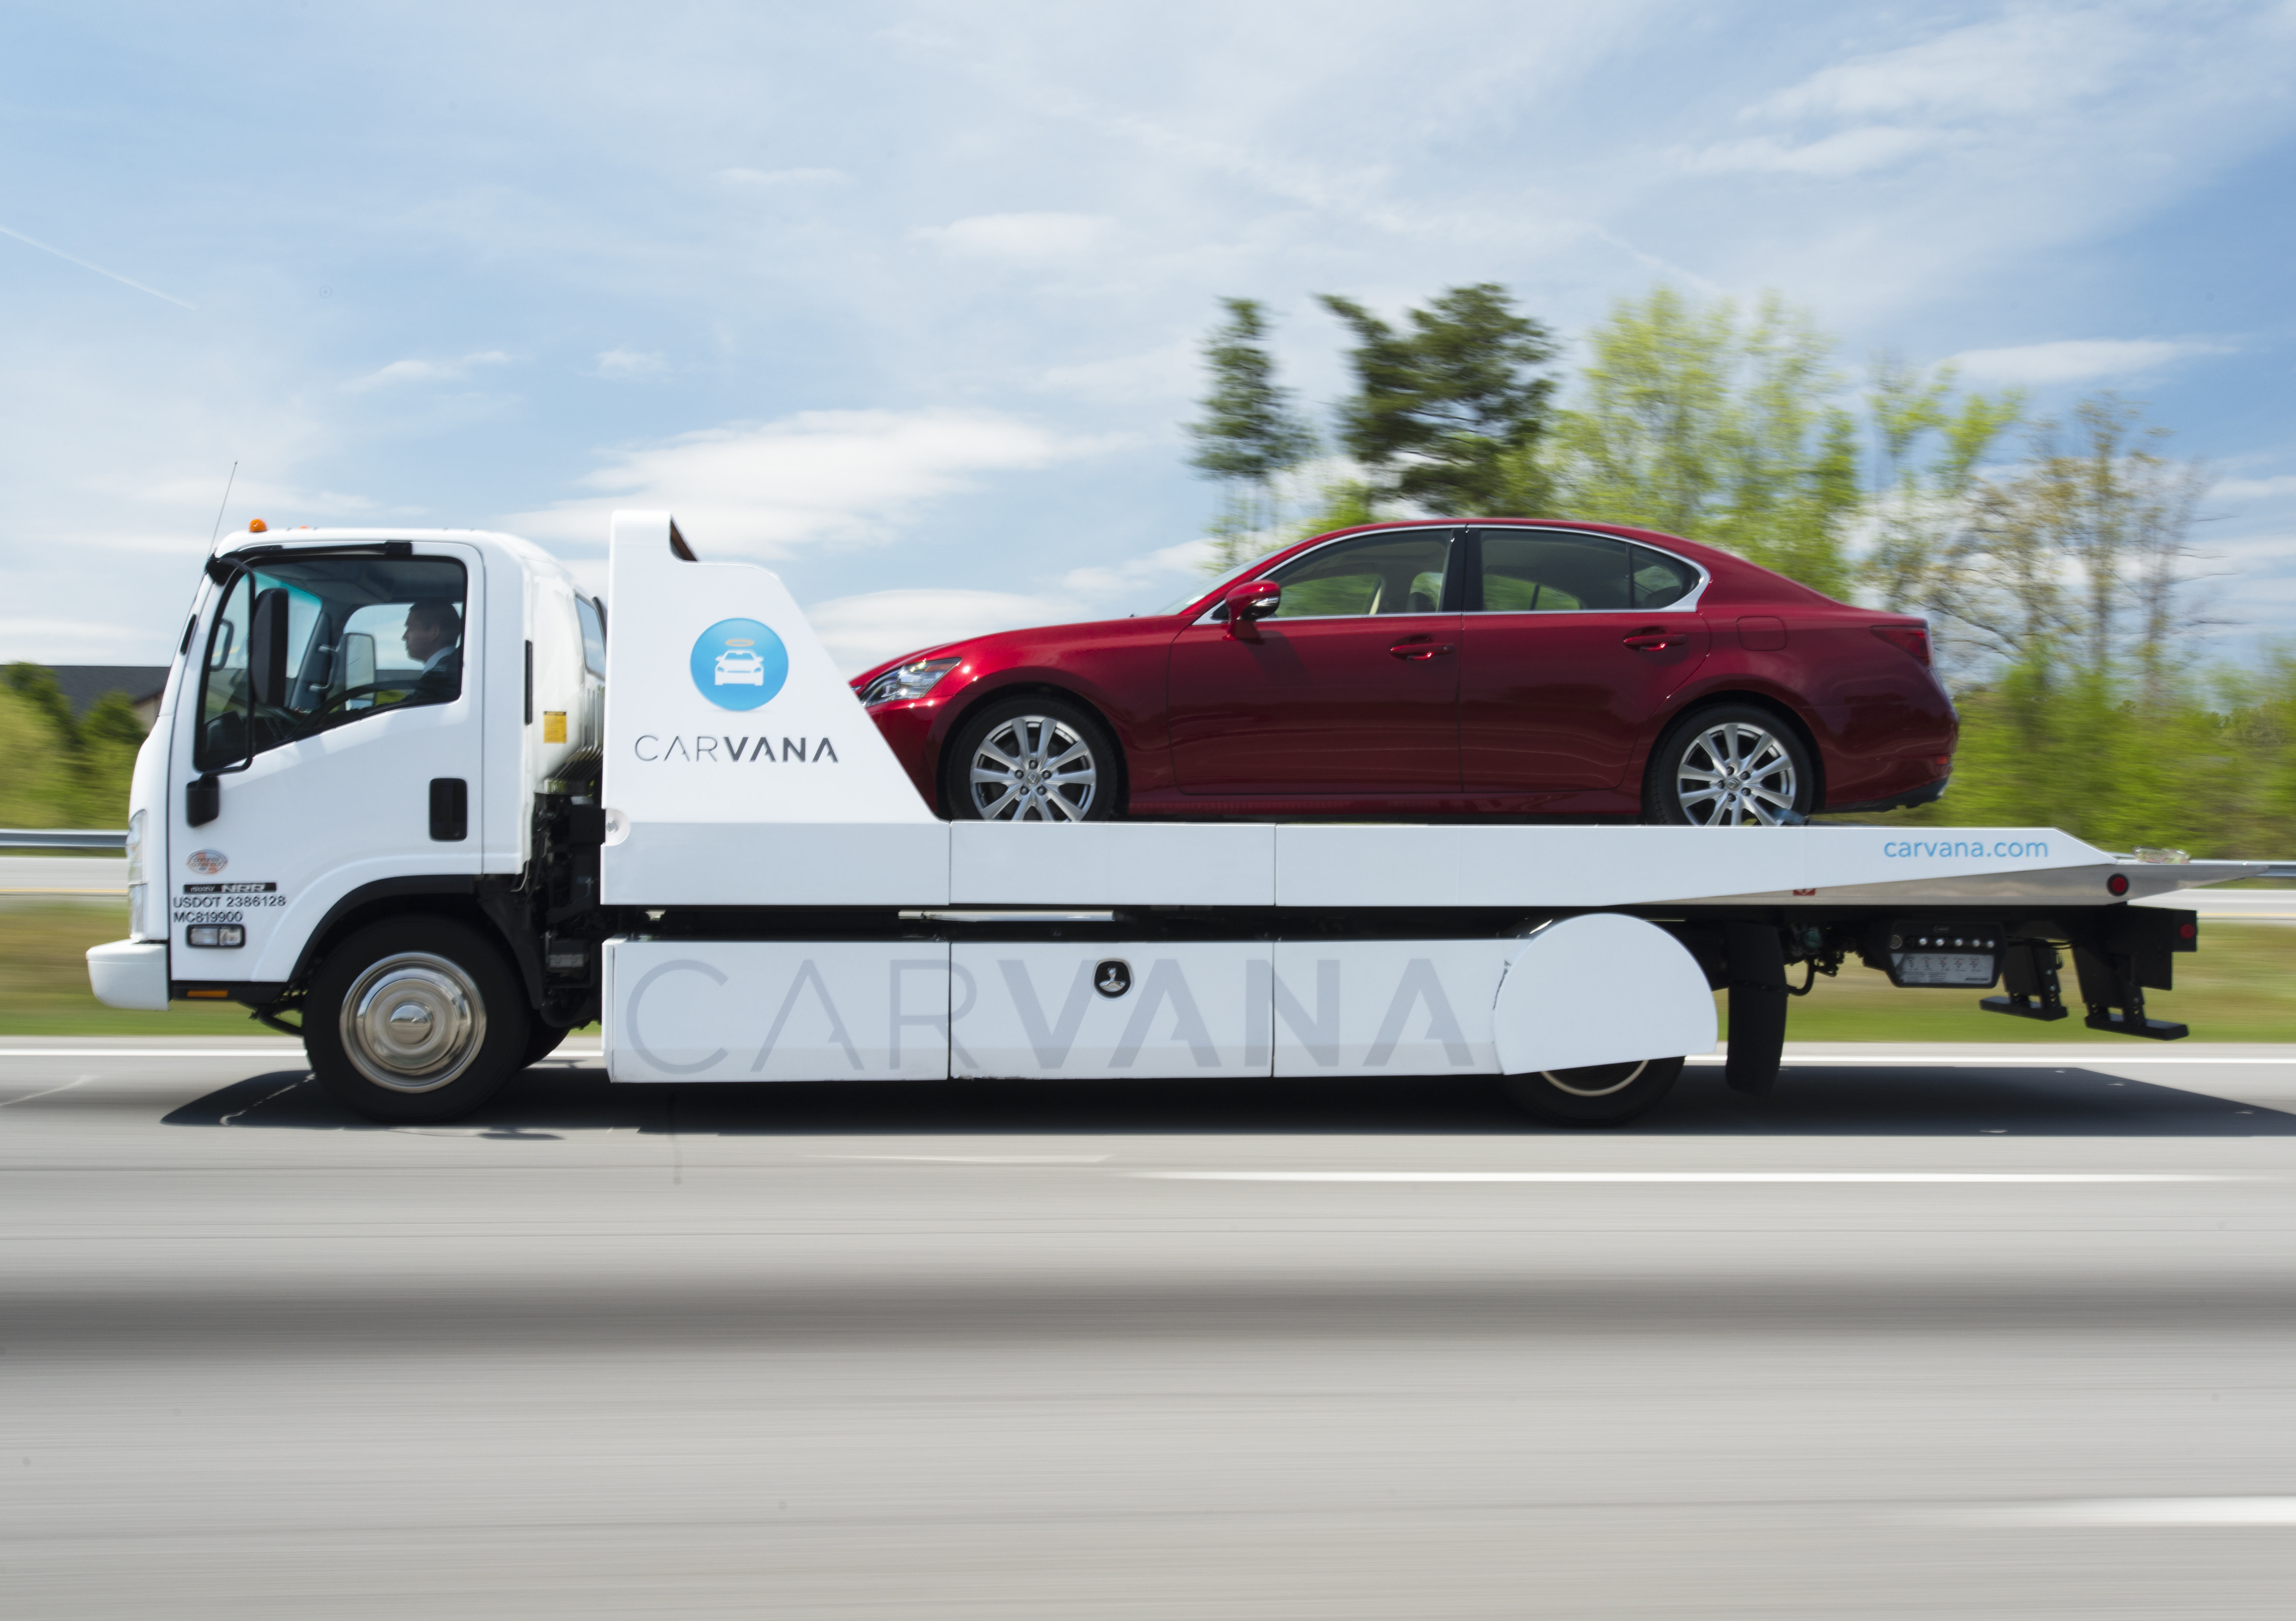 Carvana Ups Car Buying Horsepower in Lexington, Offering Free ...